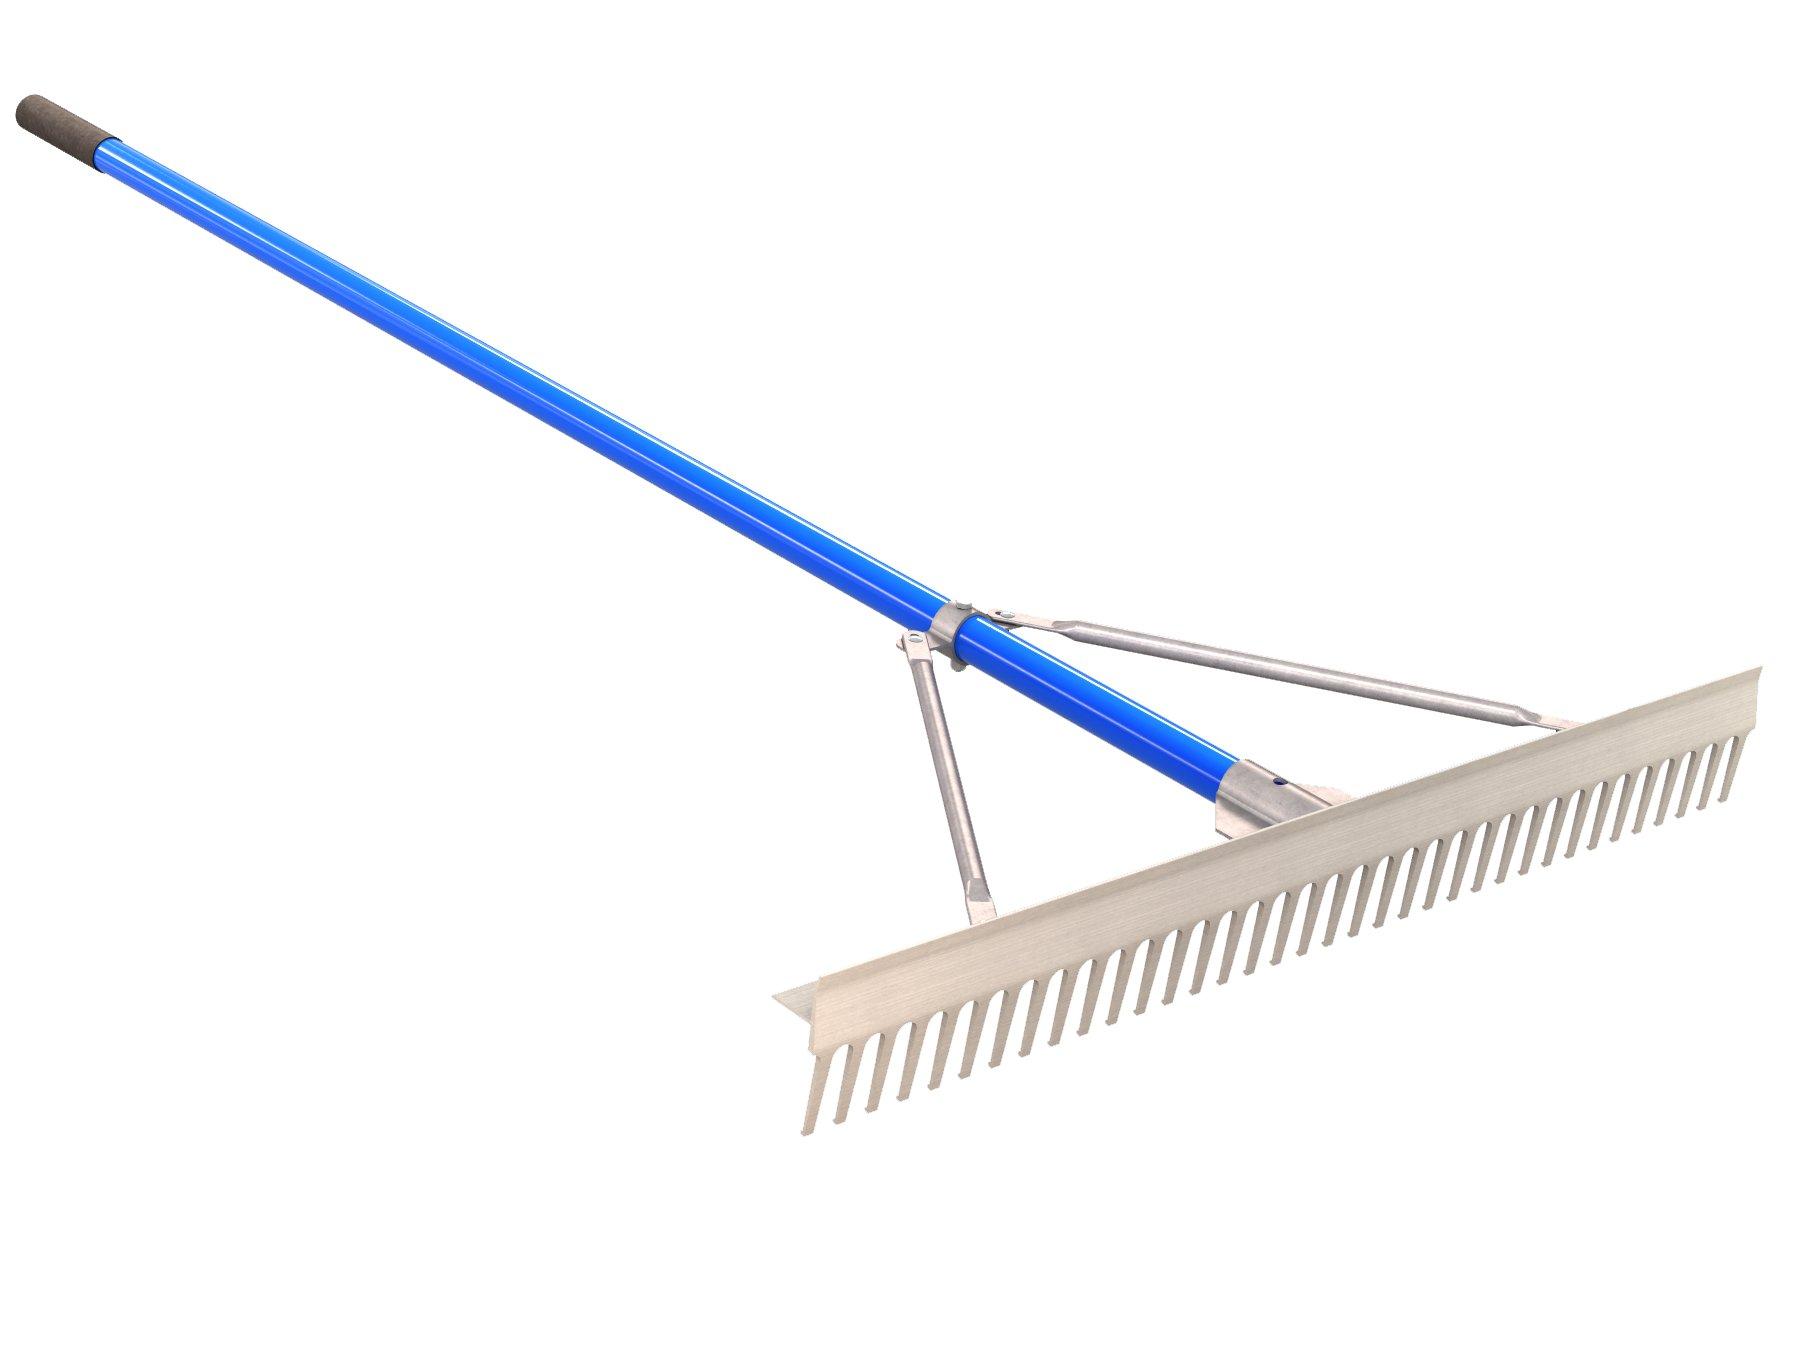 BON 14-673 36-Inch Aluminum Rake Head Professional Landscape Rake with 72-Inch Aluminum Handle